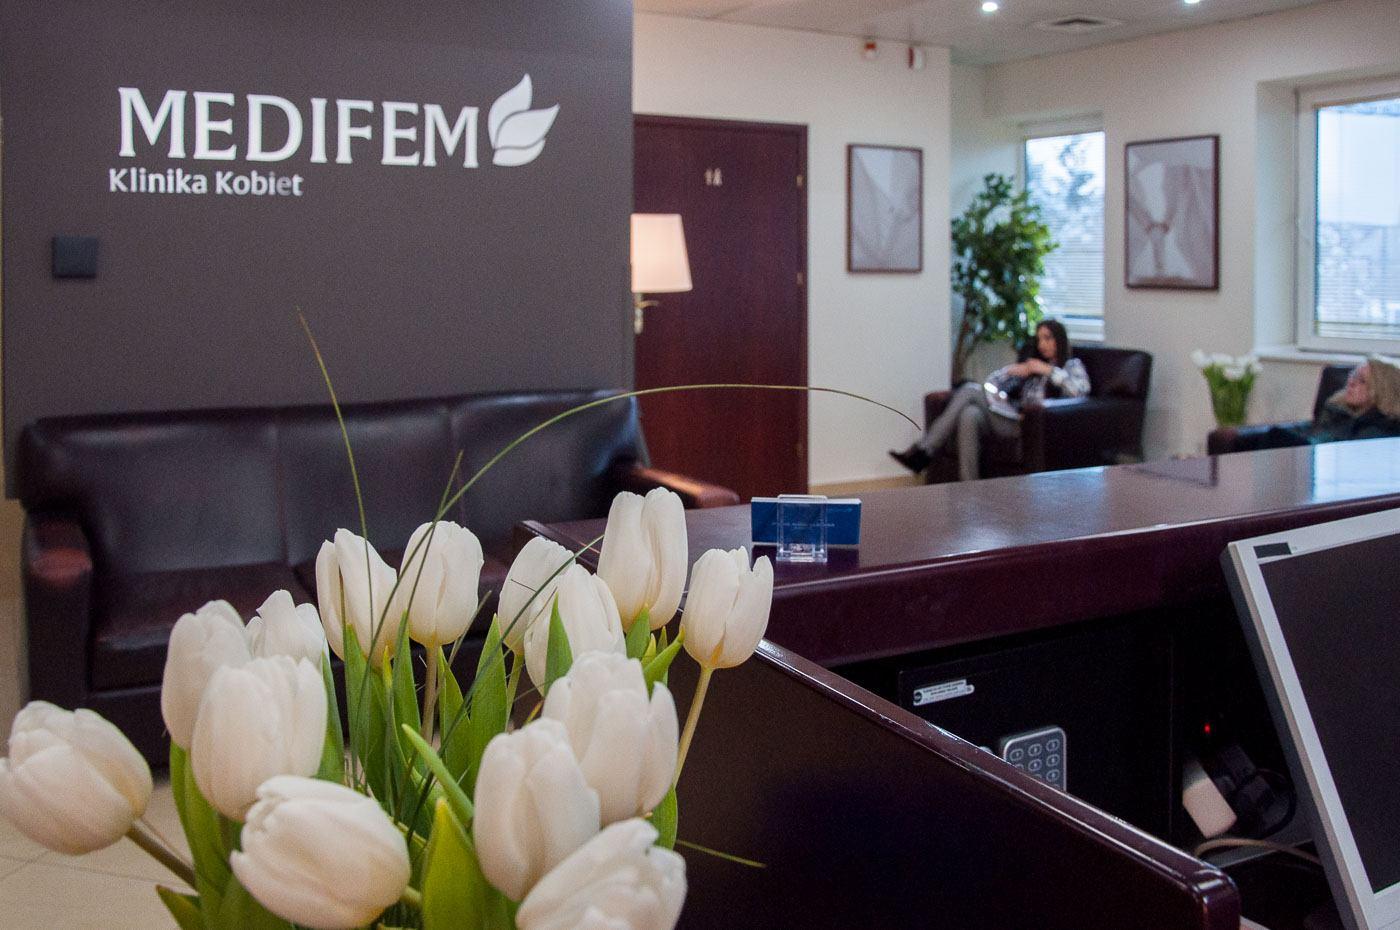 Medifem gallery - picture 1